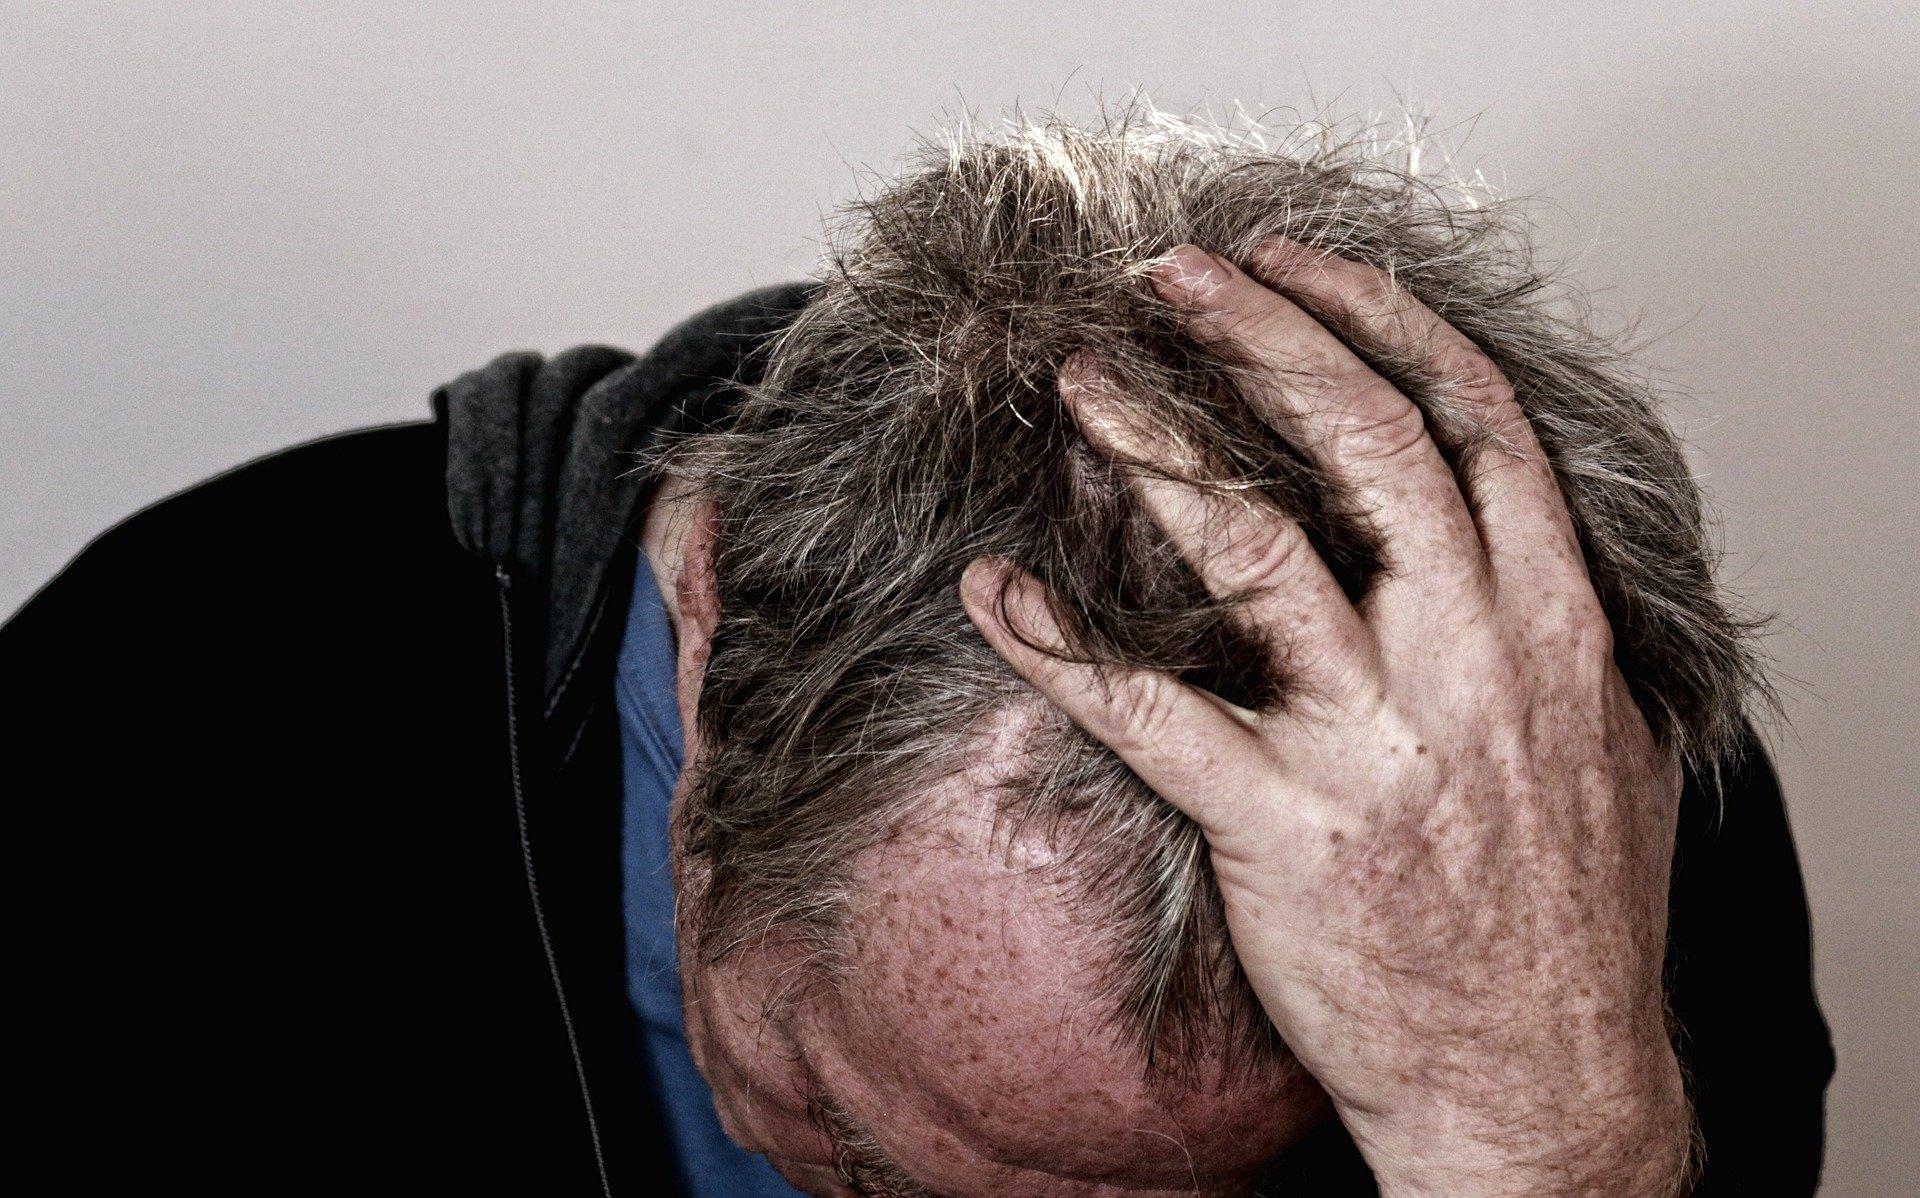 Man in despair.   Source: Pixabay